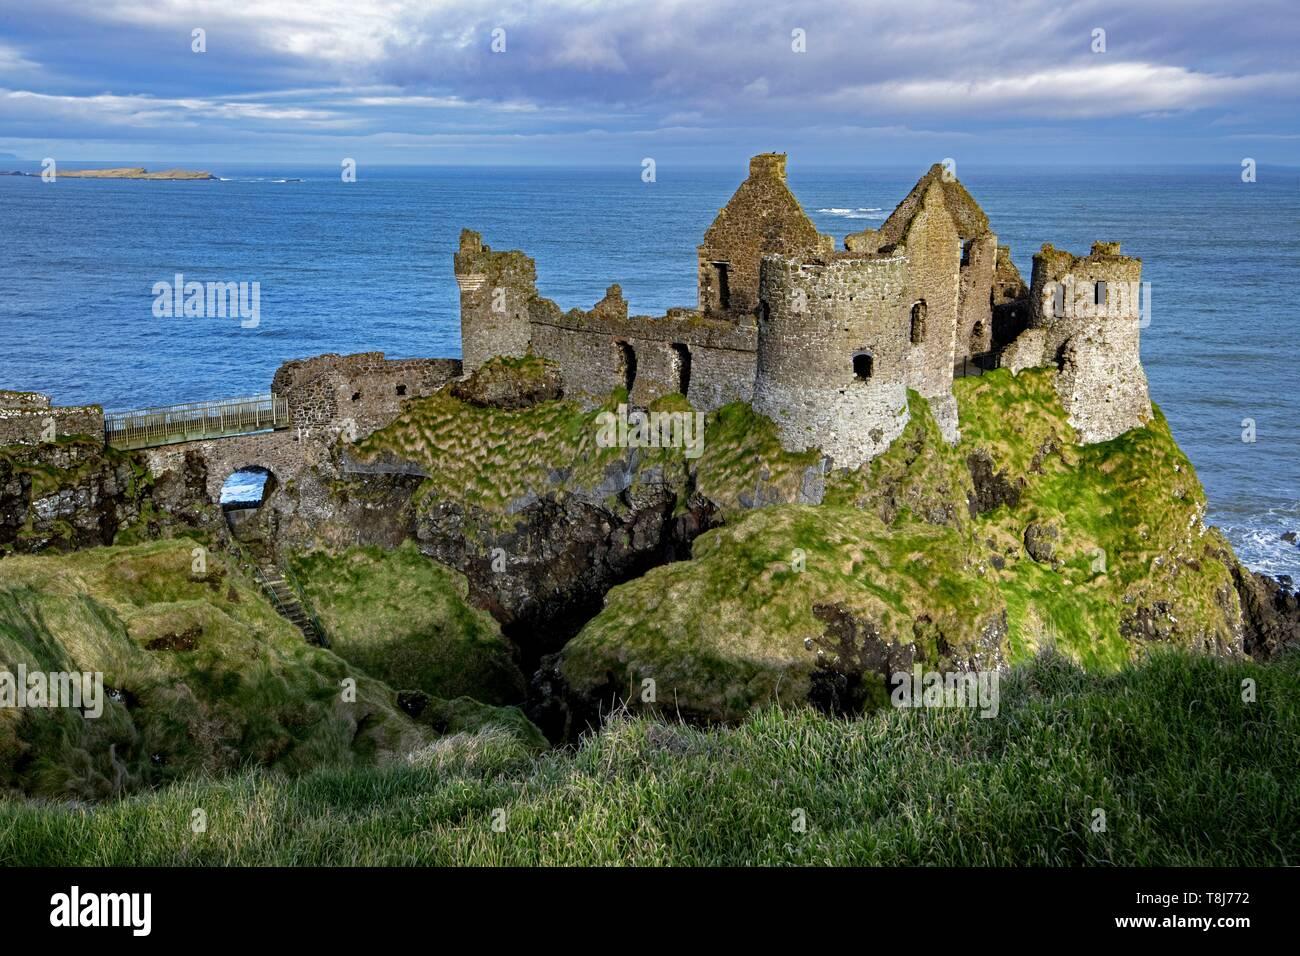 United Kingdom, Northern Ireland, Ulster, county Antrim, Dunluce castle - Stock Image